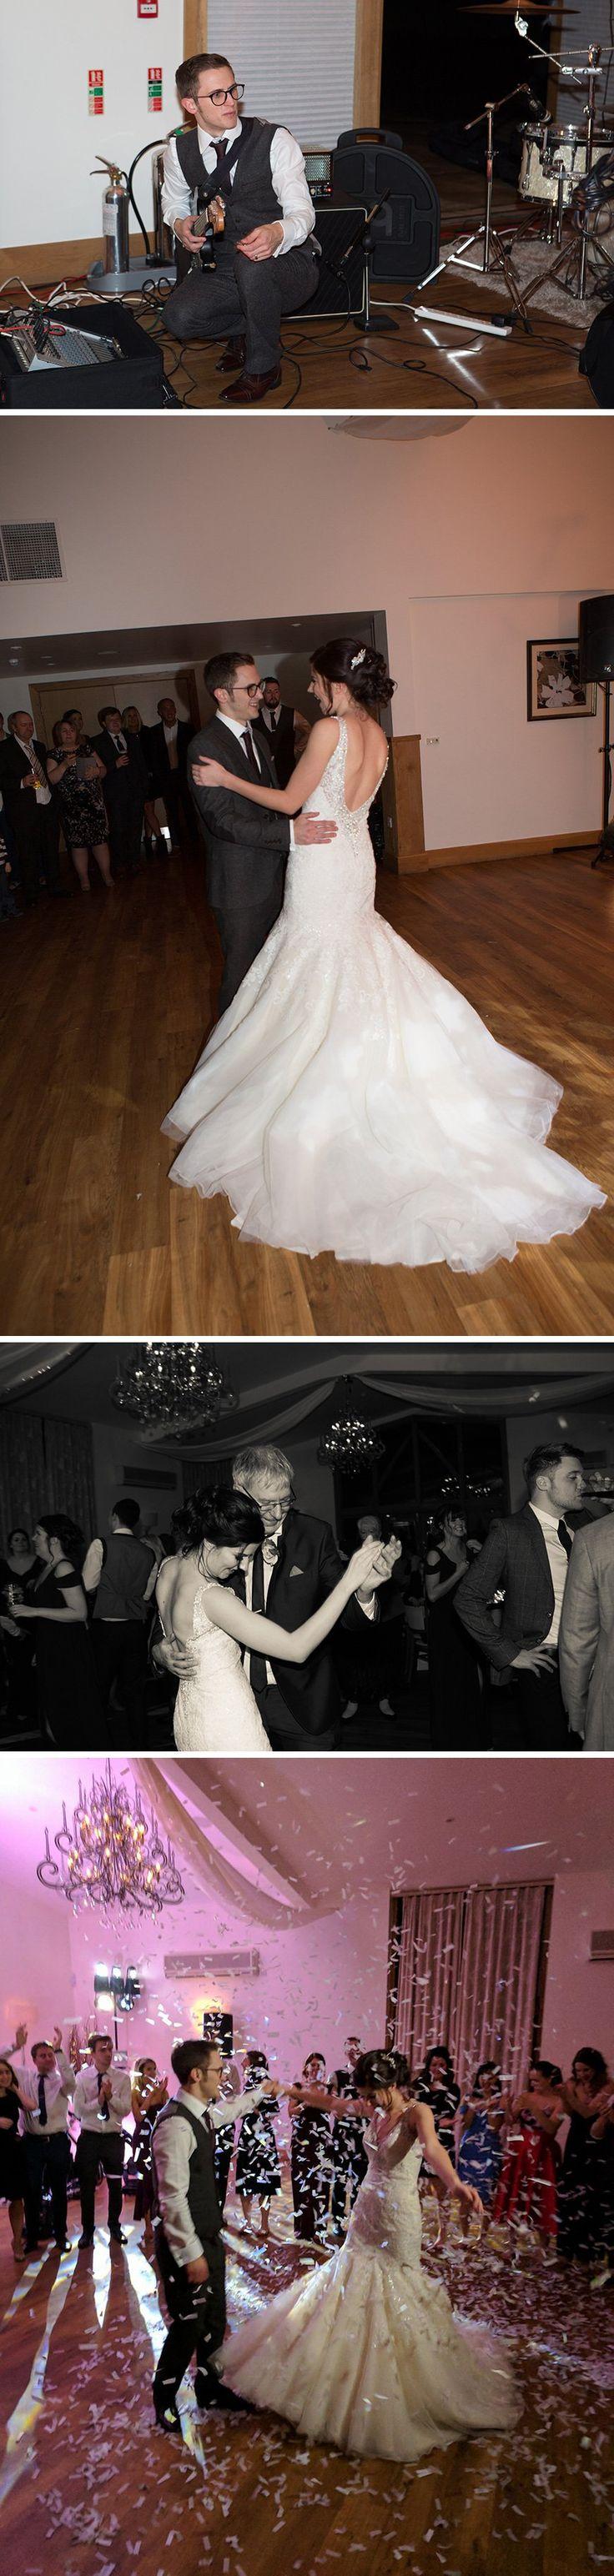 Real Wedding - Rose and Daniel's Glamorous Winter Wedding At Mythe Barn | CHWV